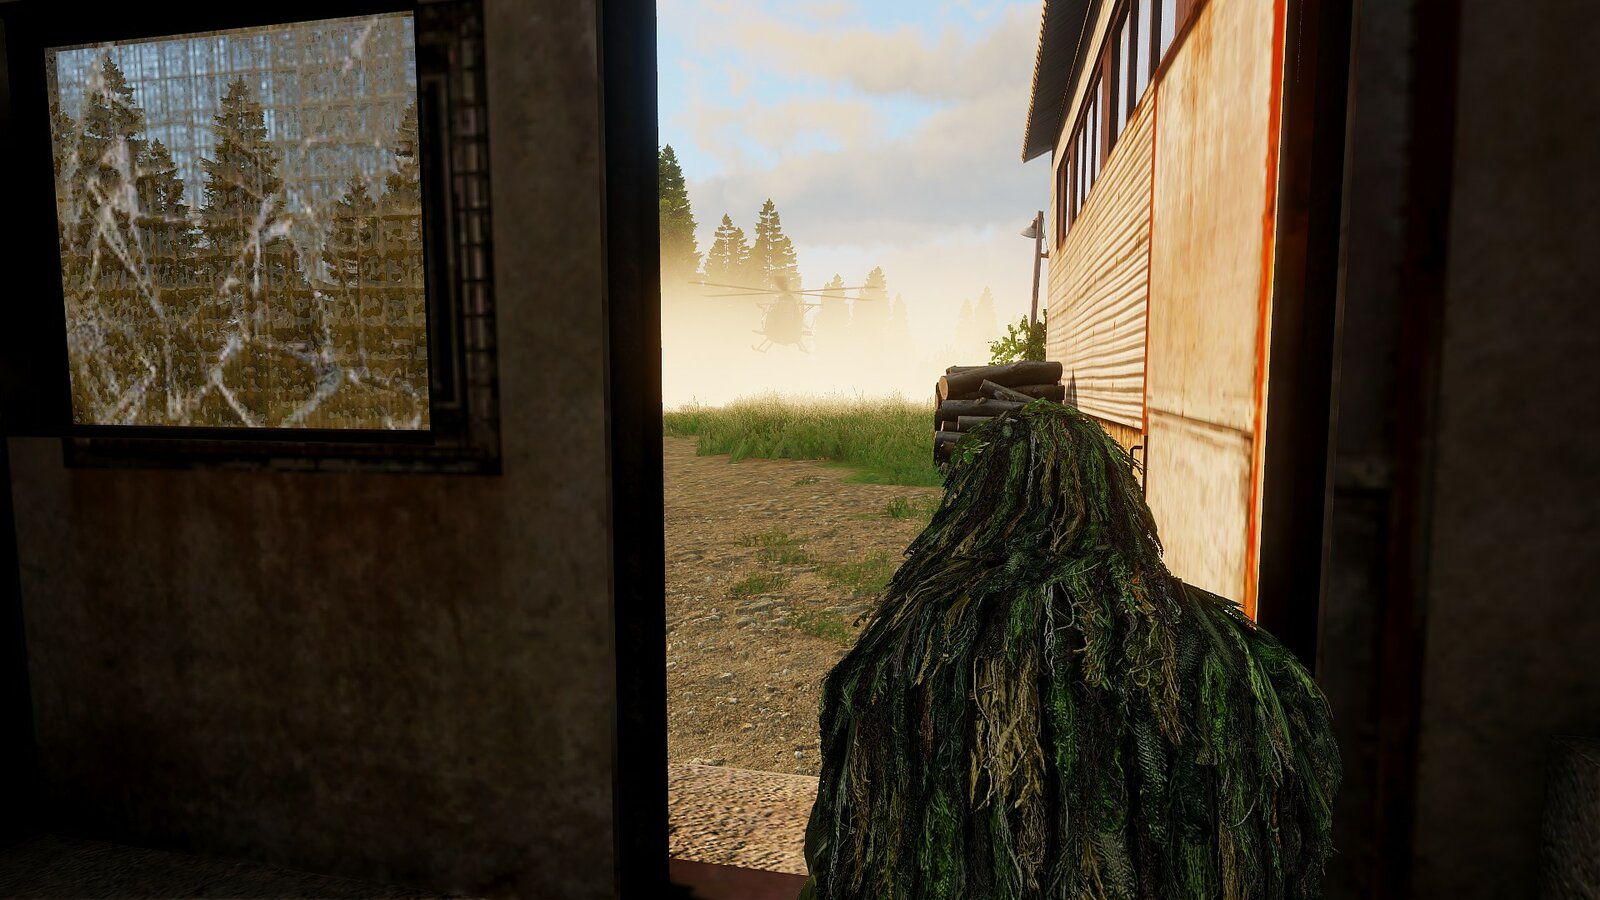 Wookiee in der Tür